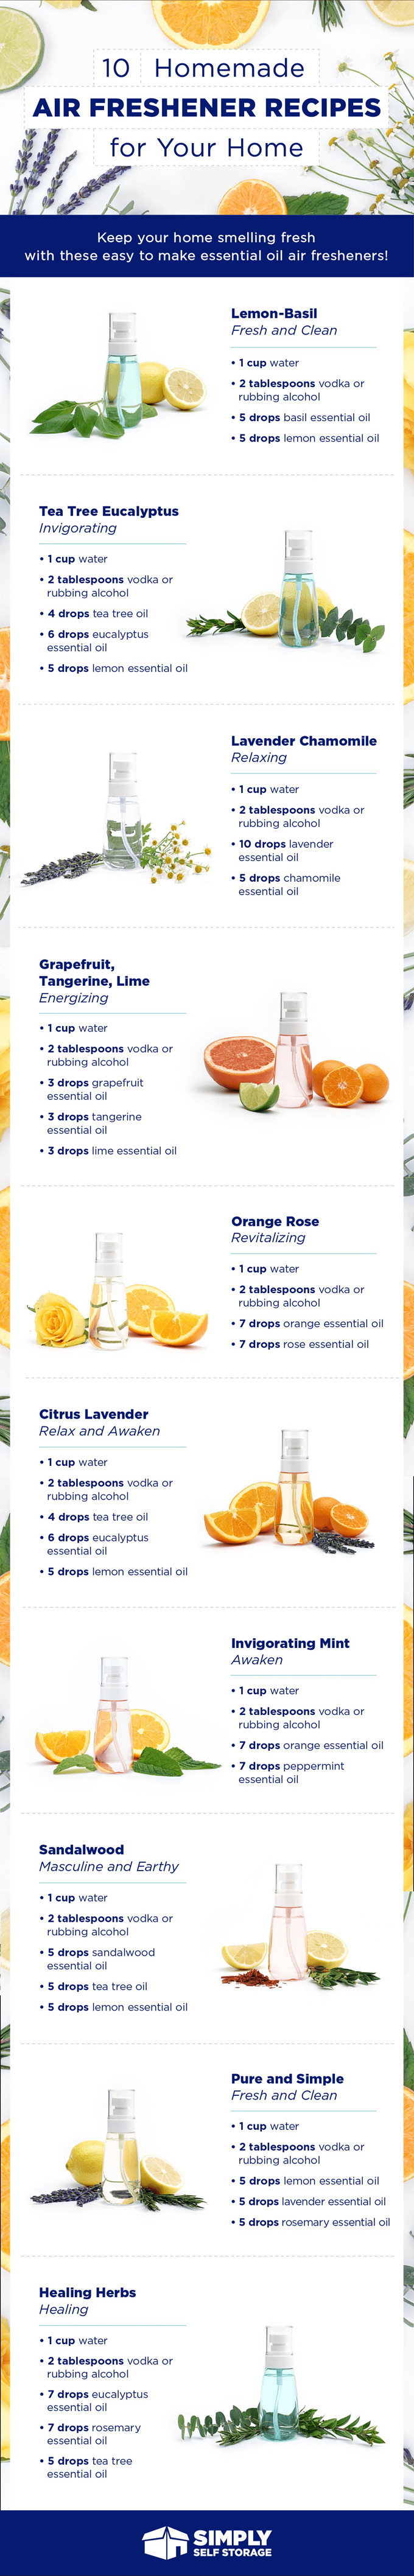 diy air freshener 1